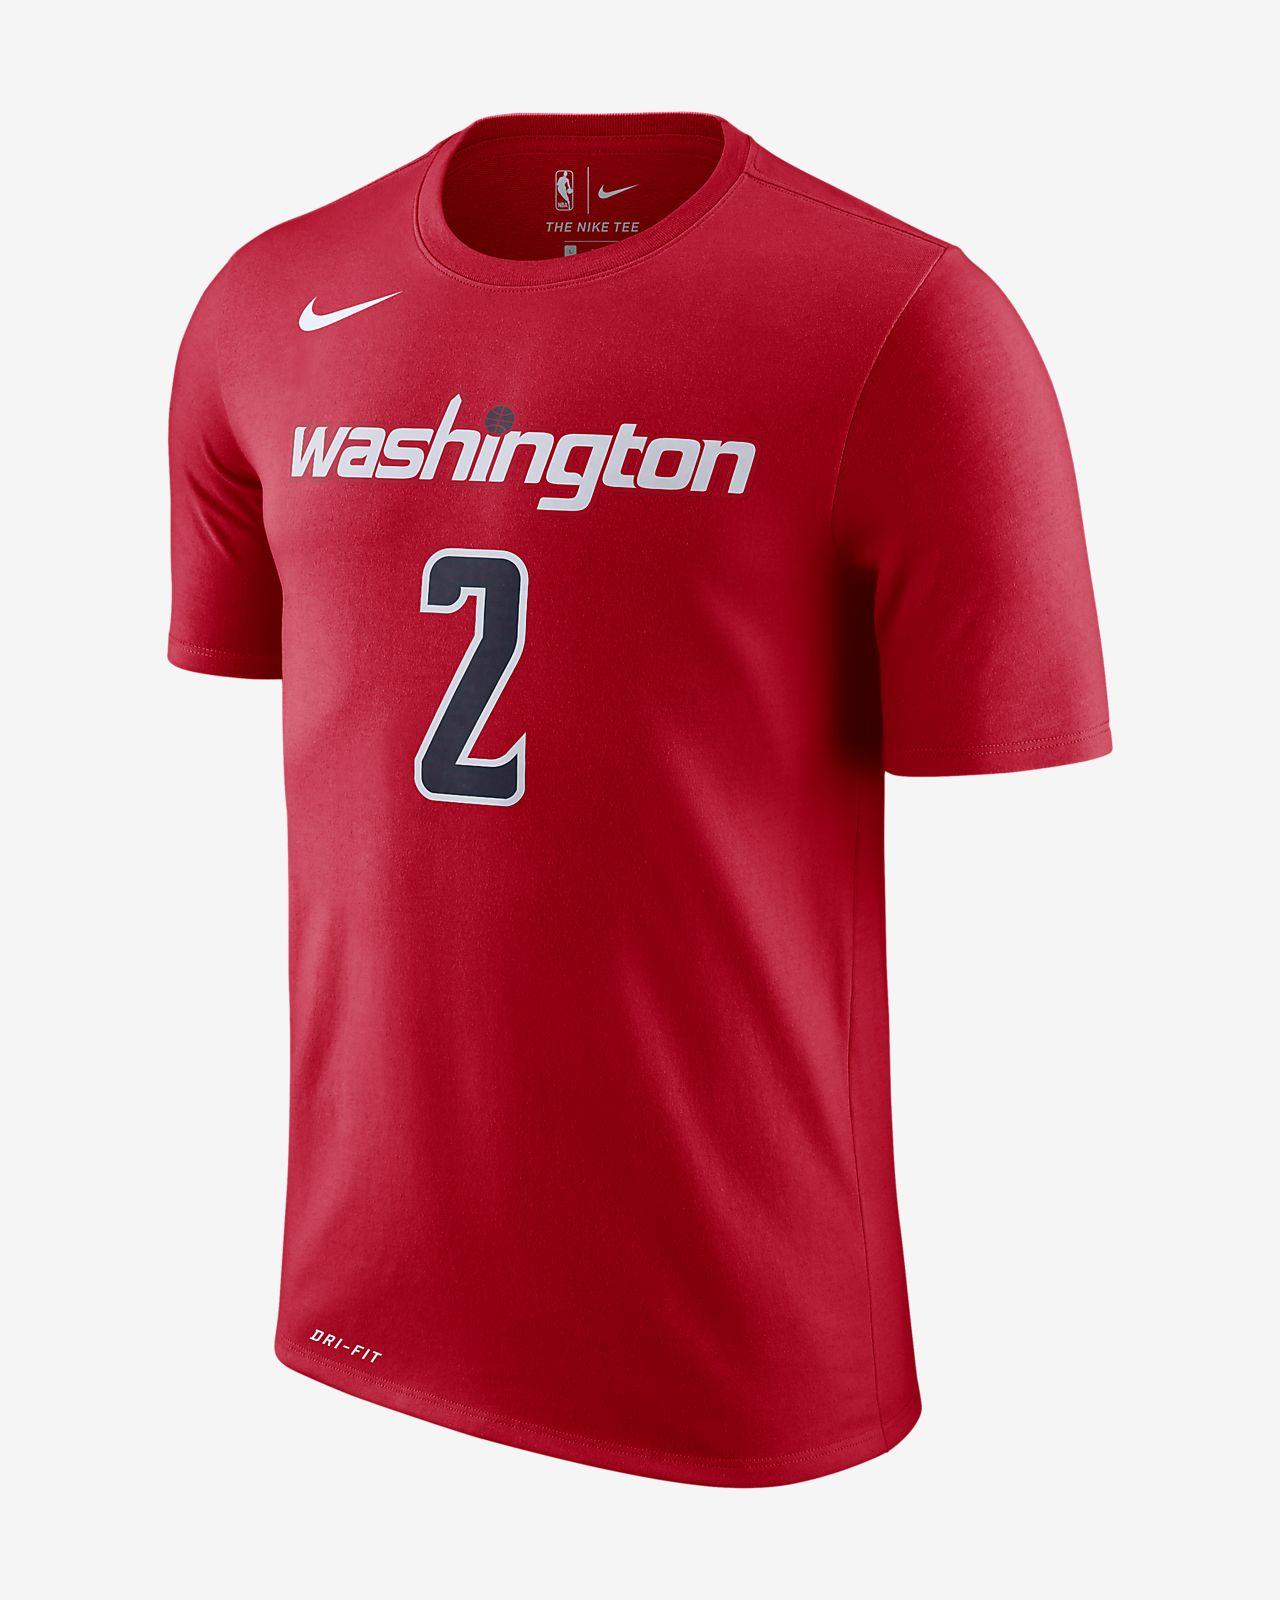 new style 4eb09 ae7f0 John Wall Washington Wizards Nike Dri-FIT Men's NBA T-Shirt